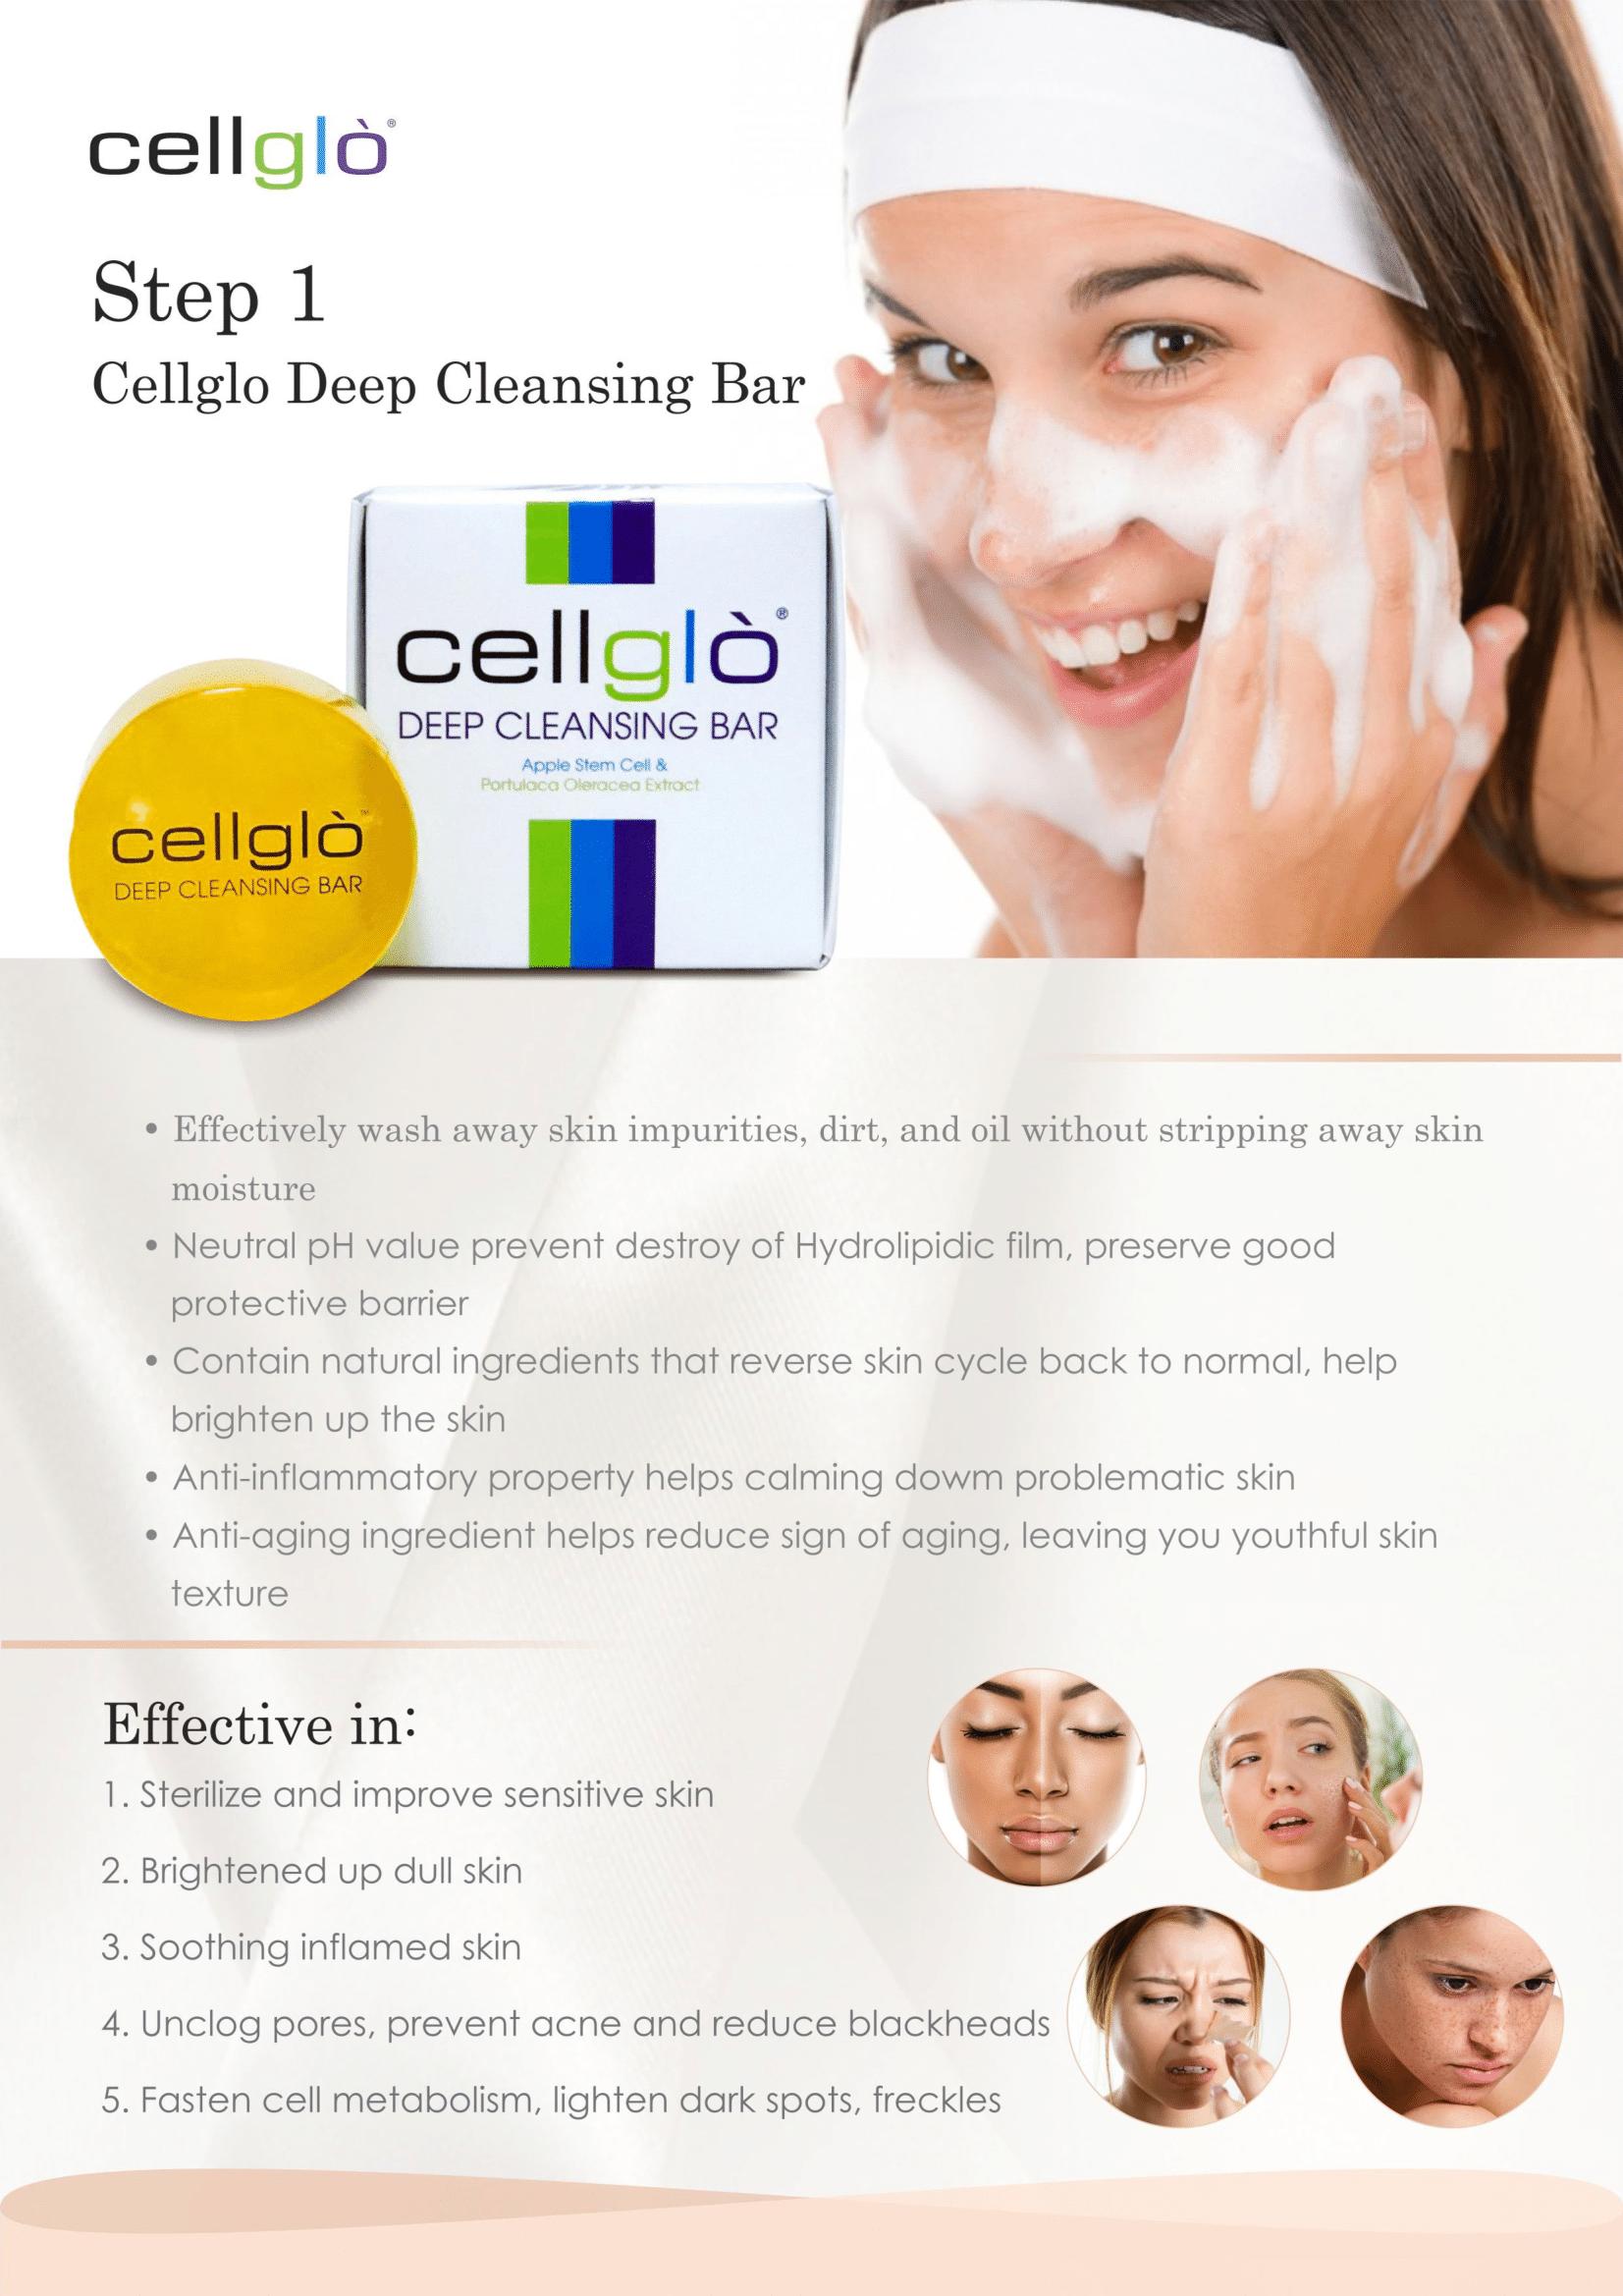 Cellglo Deep Cleansing Bar Info 3